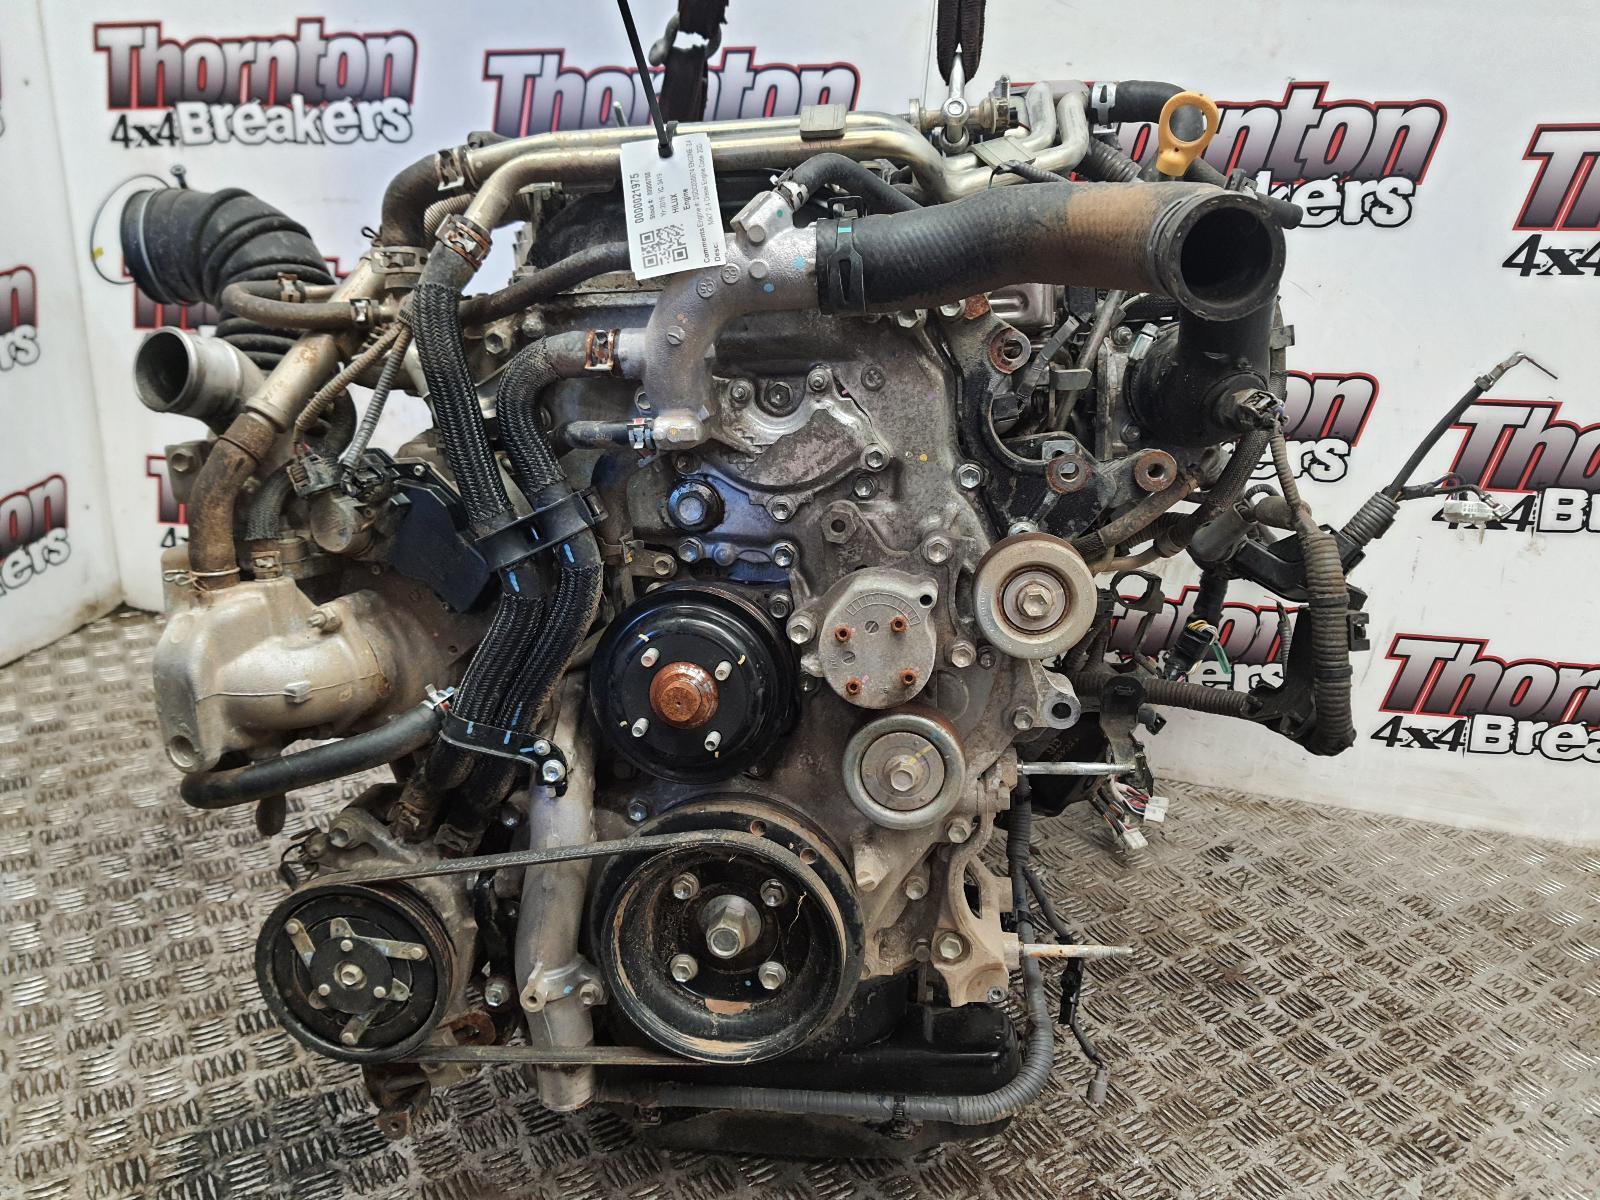 Image for a 2016 TOYOTA HILUX 2.4 Diesel 2GD-FTV Engine